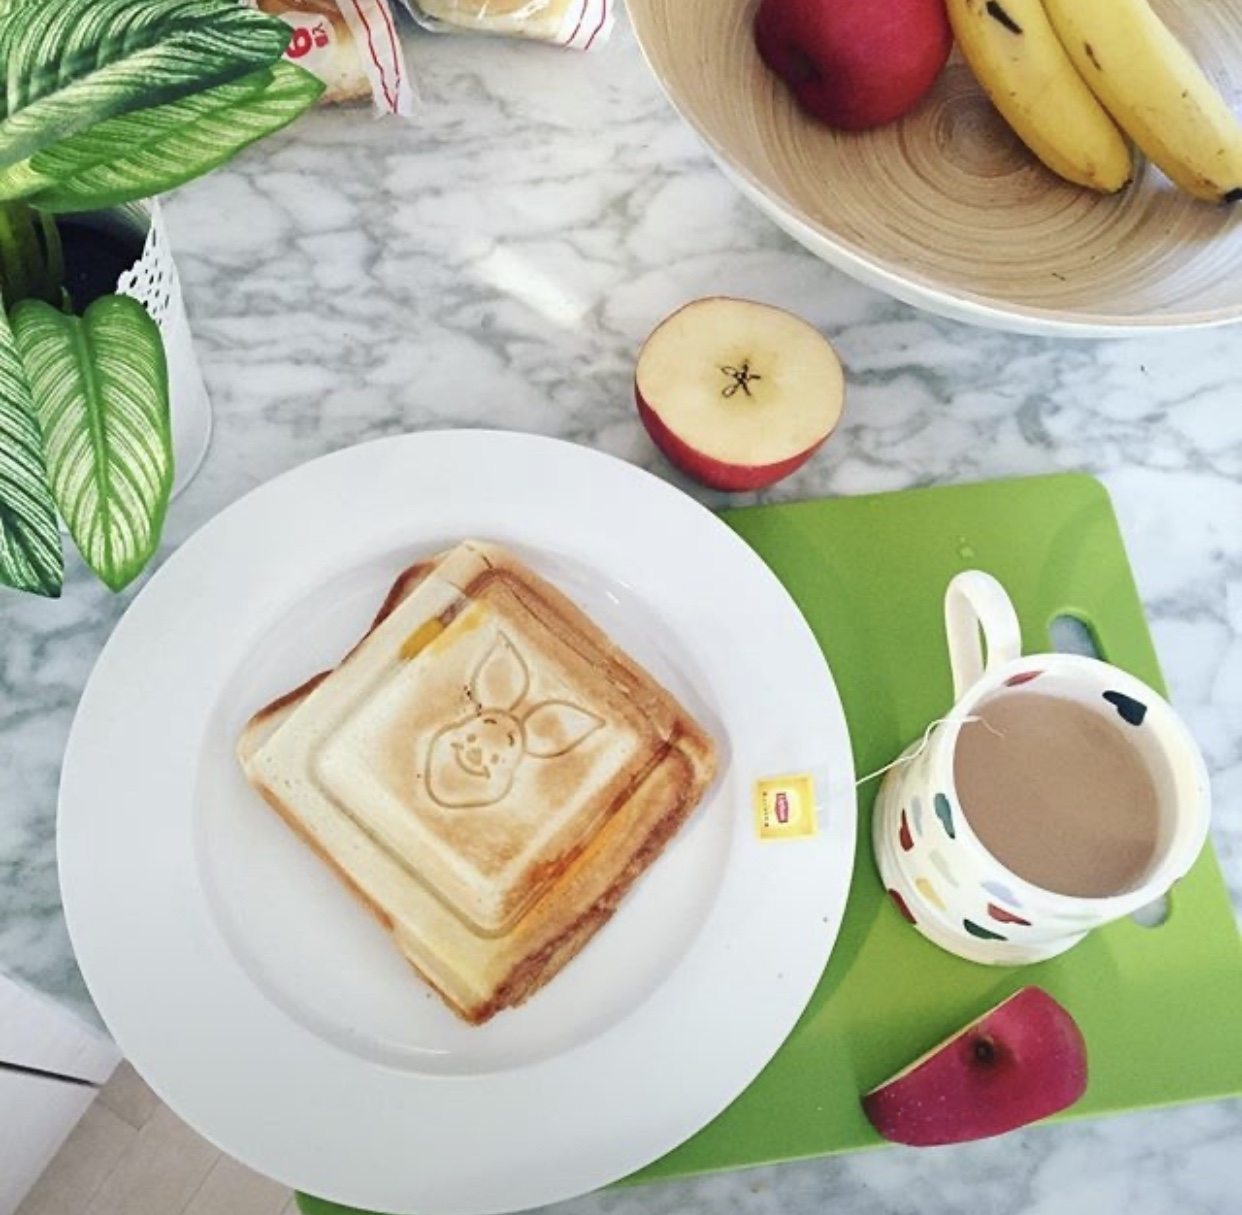 DISNEY PRINCESS SET OF 2 MULTI PURPOSE FOOD SANDWICH CONTAINERS DISHWASHER OK